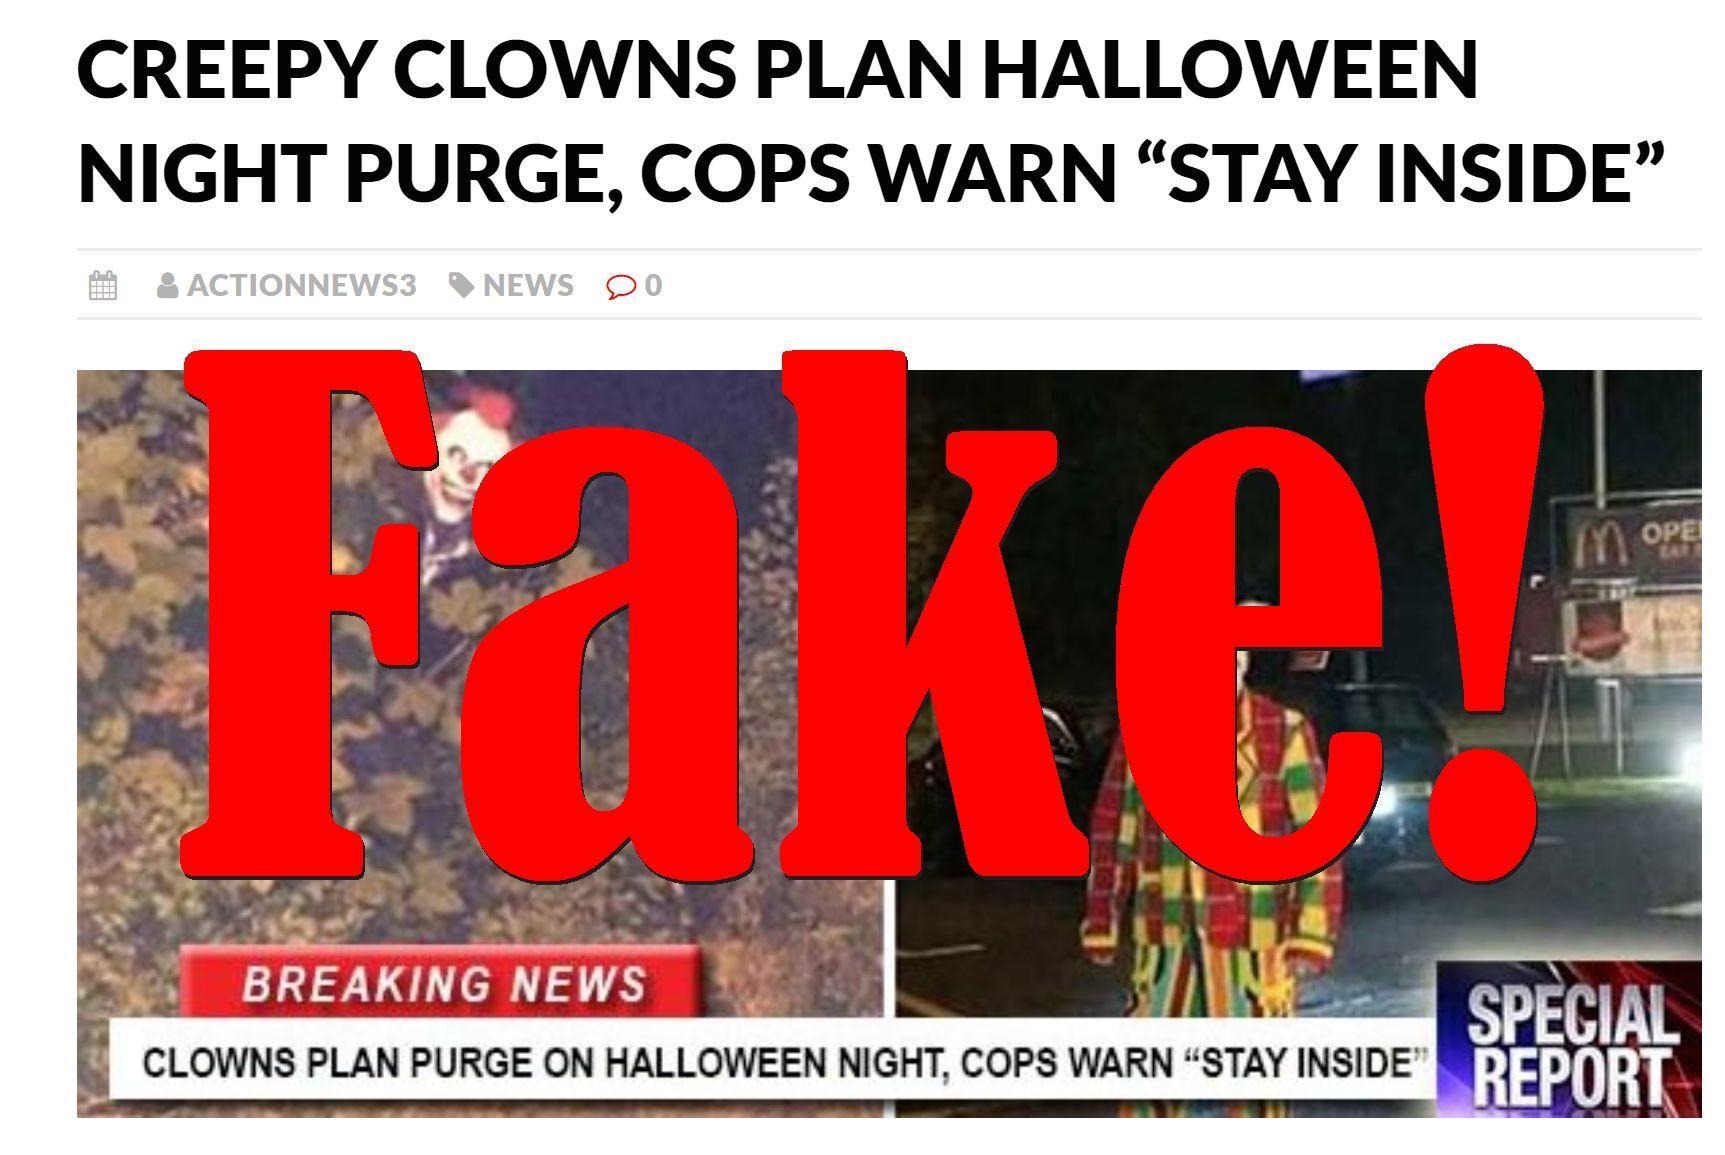 Fake News: Creepy Clowns NOT Planning Halloween Night Purge